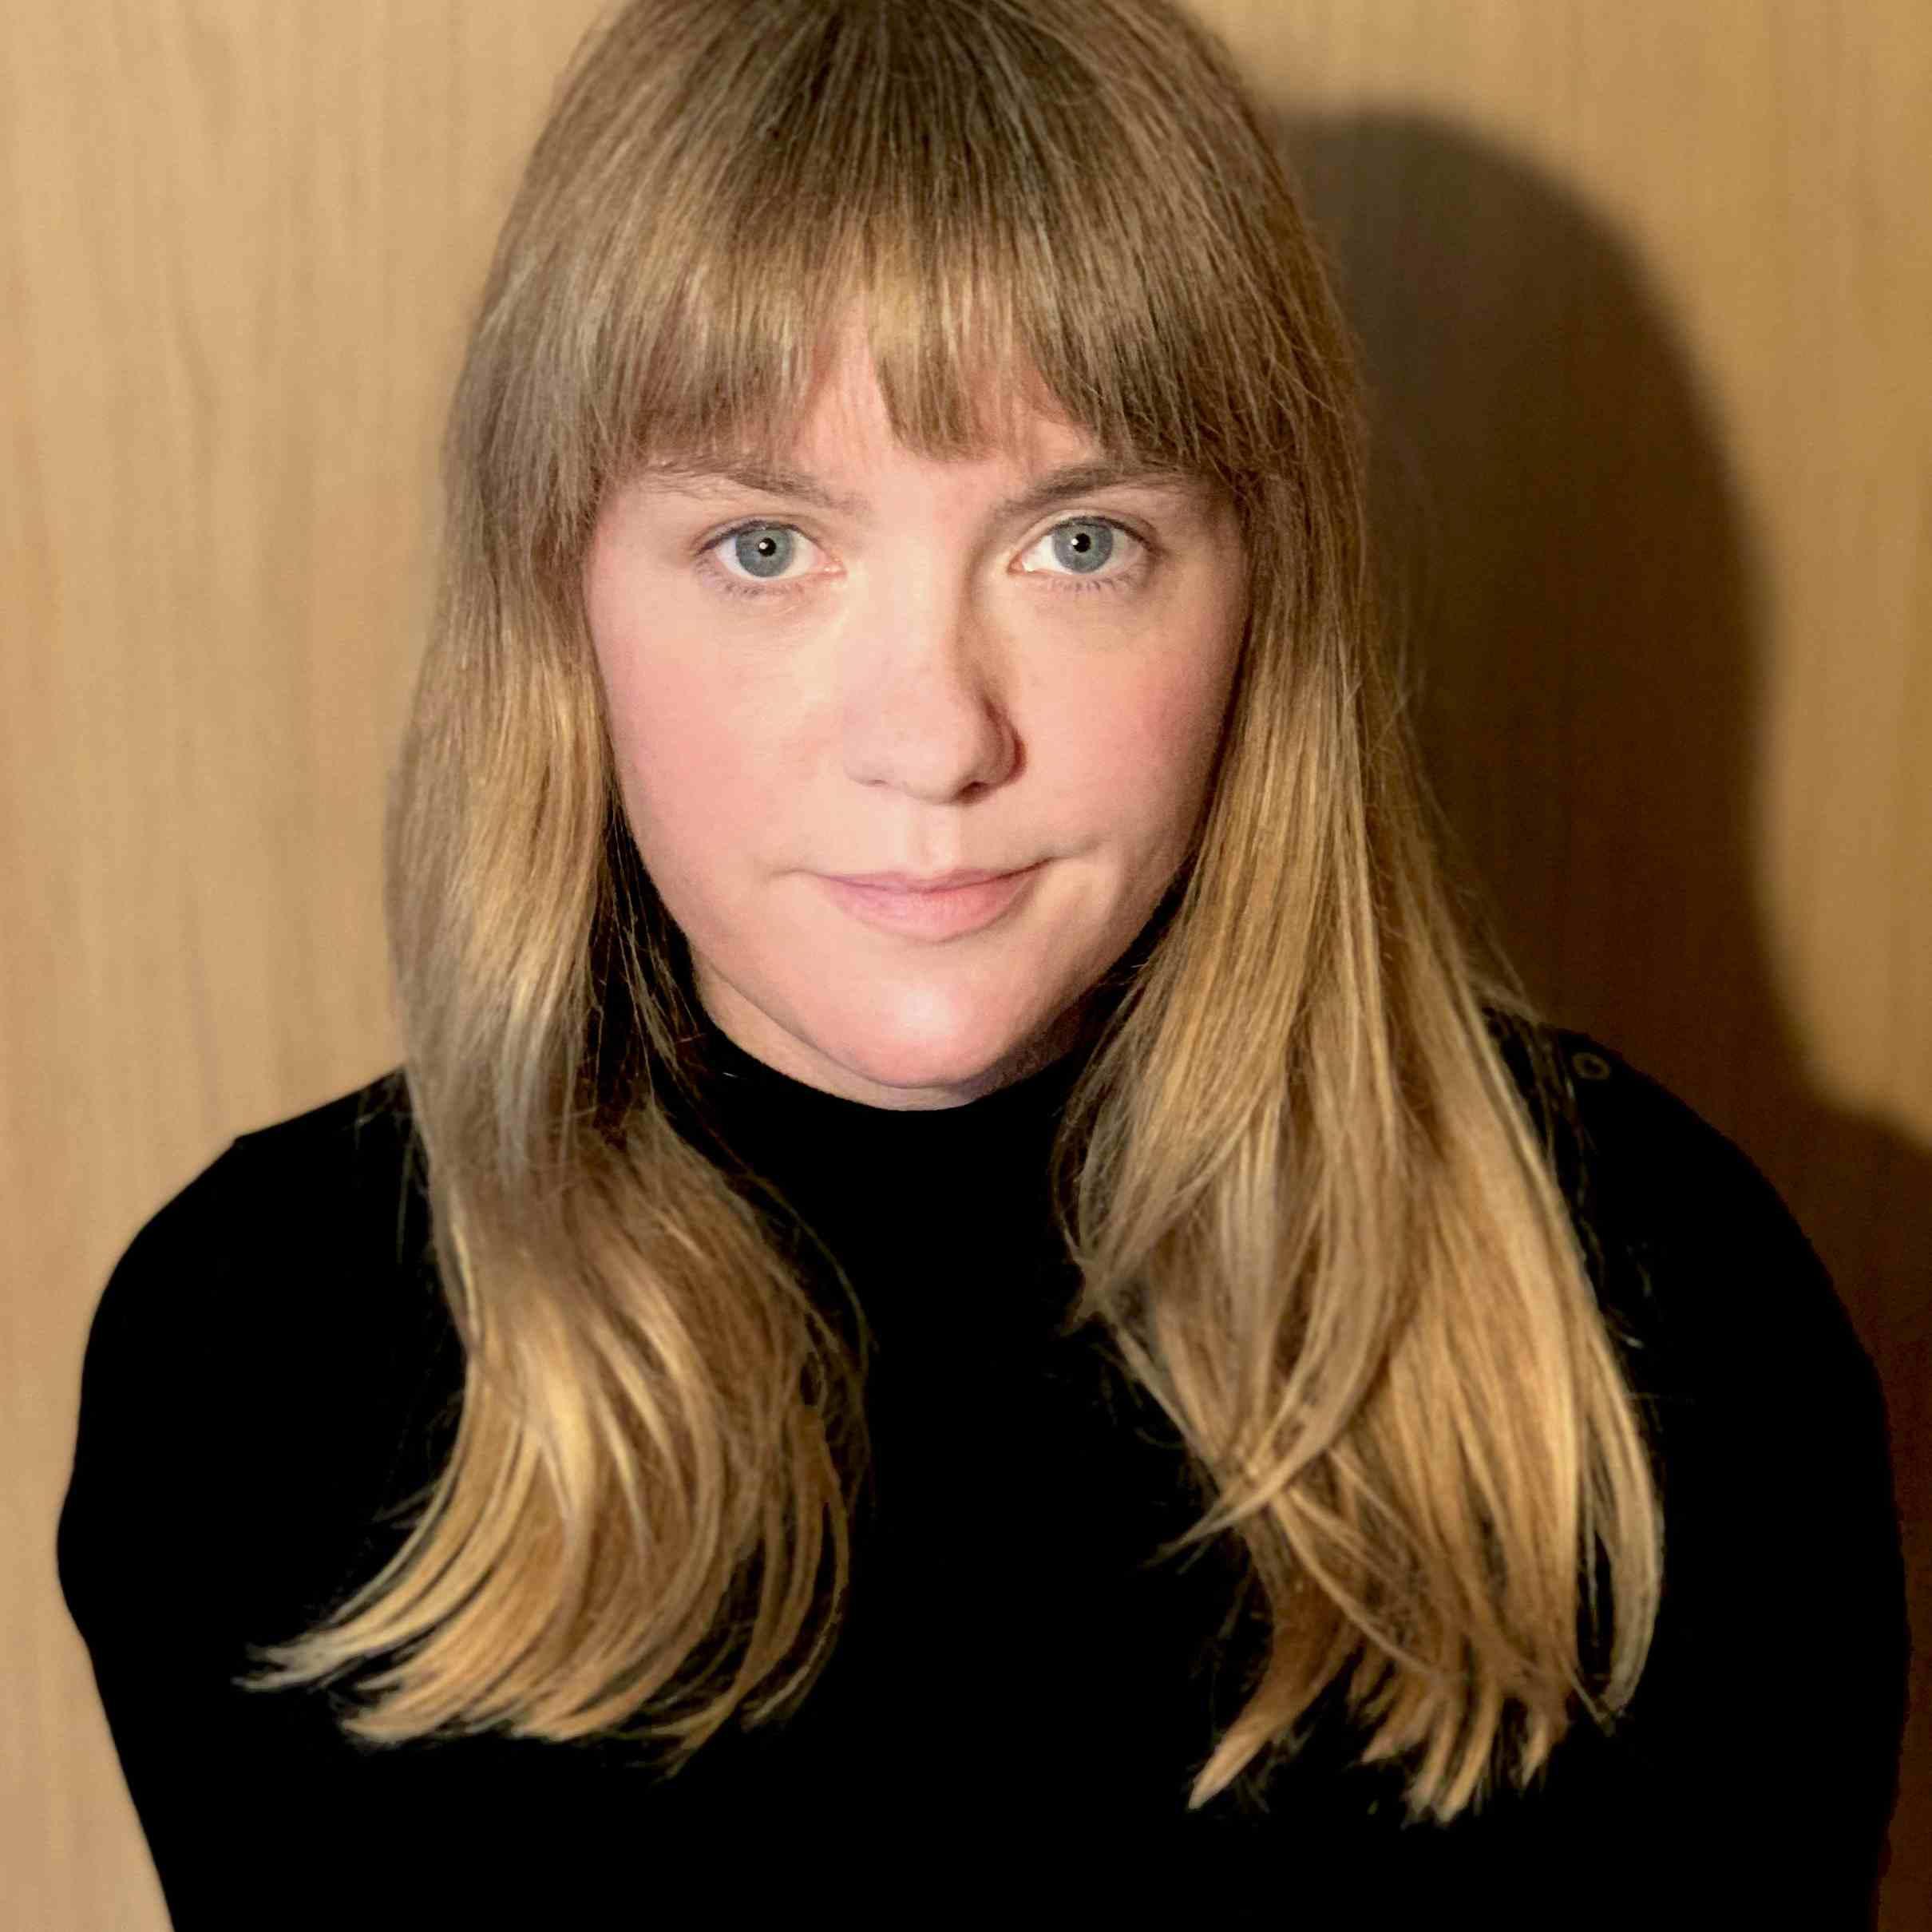 Chloe McCarrick